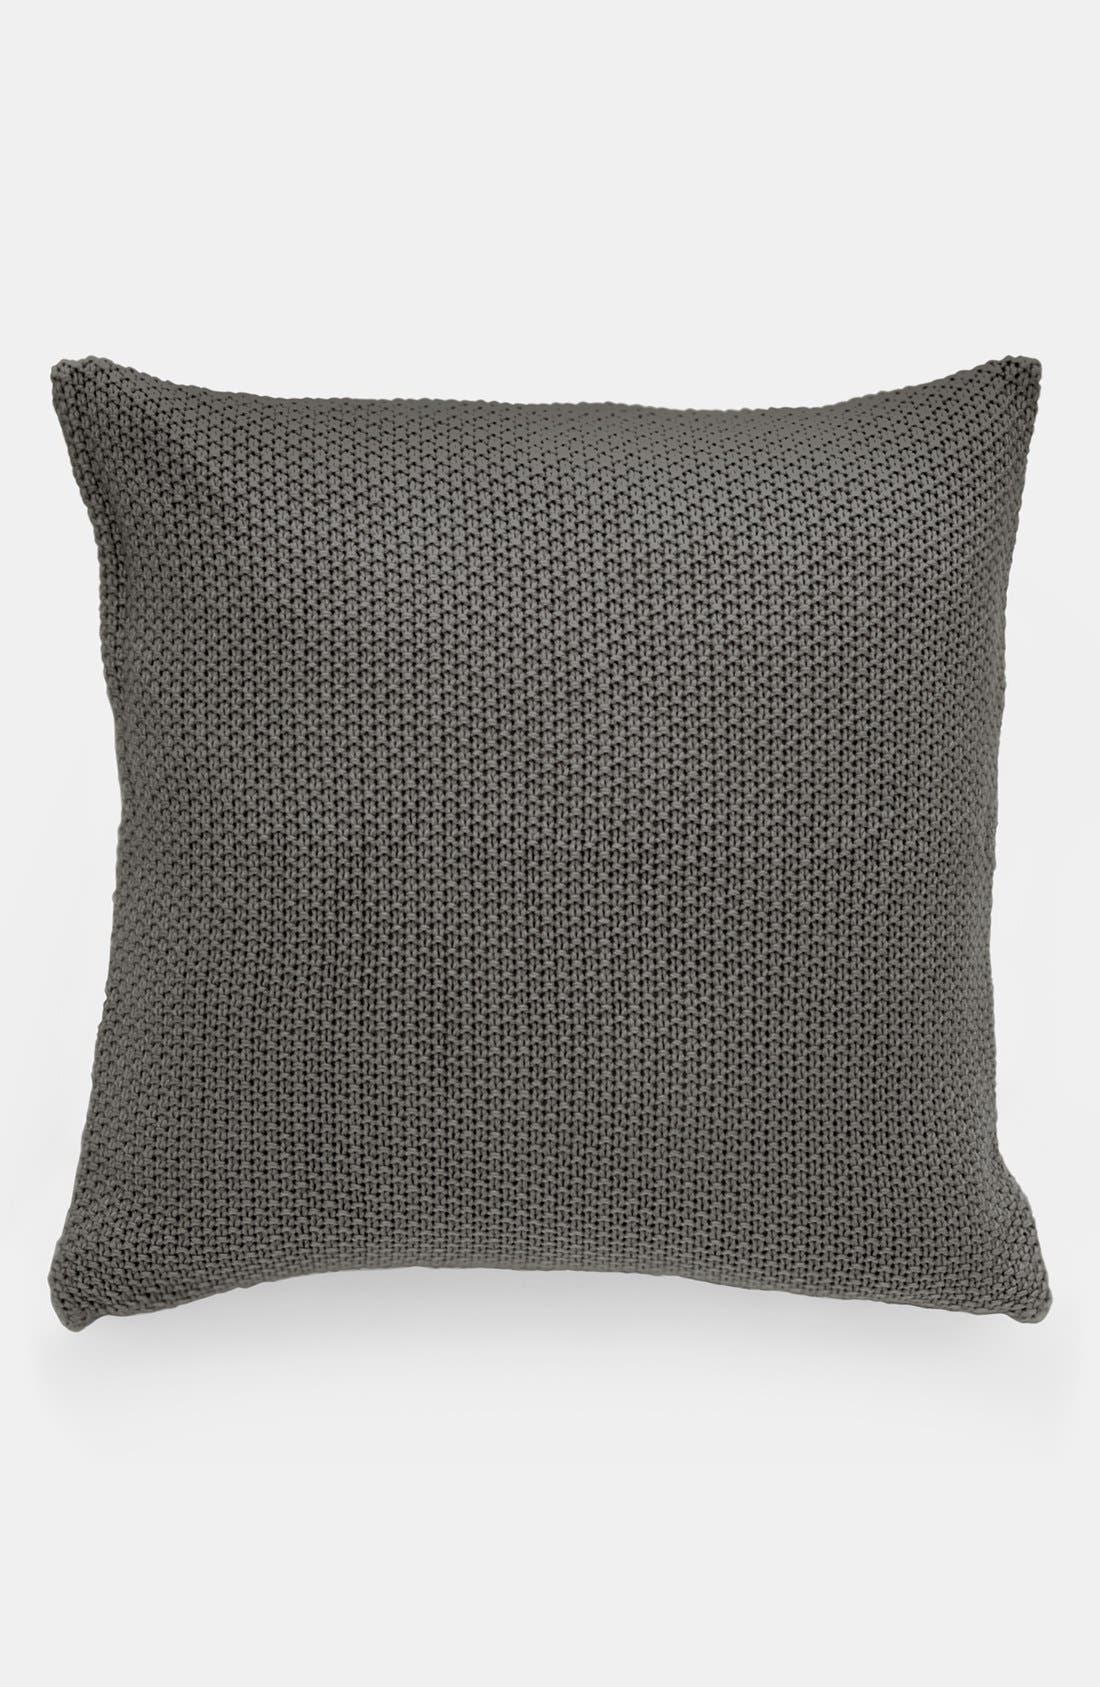 Alternate Image 1 Selected - Donna Karan 'Essentials - Knit' Euro Sham (Online Only)